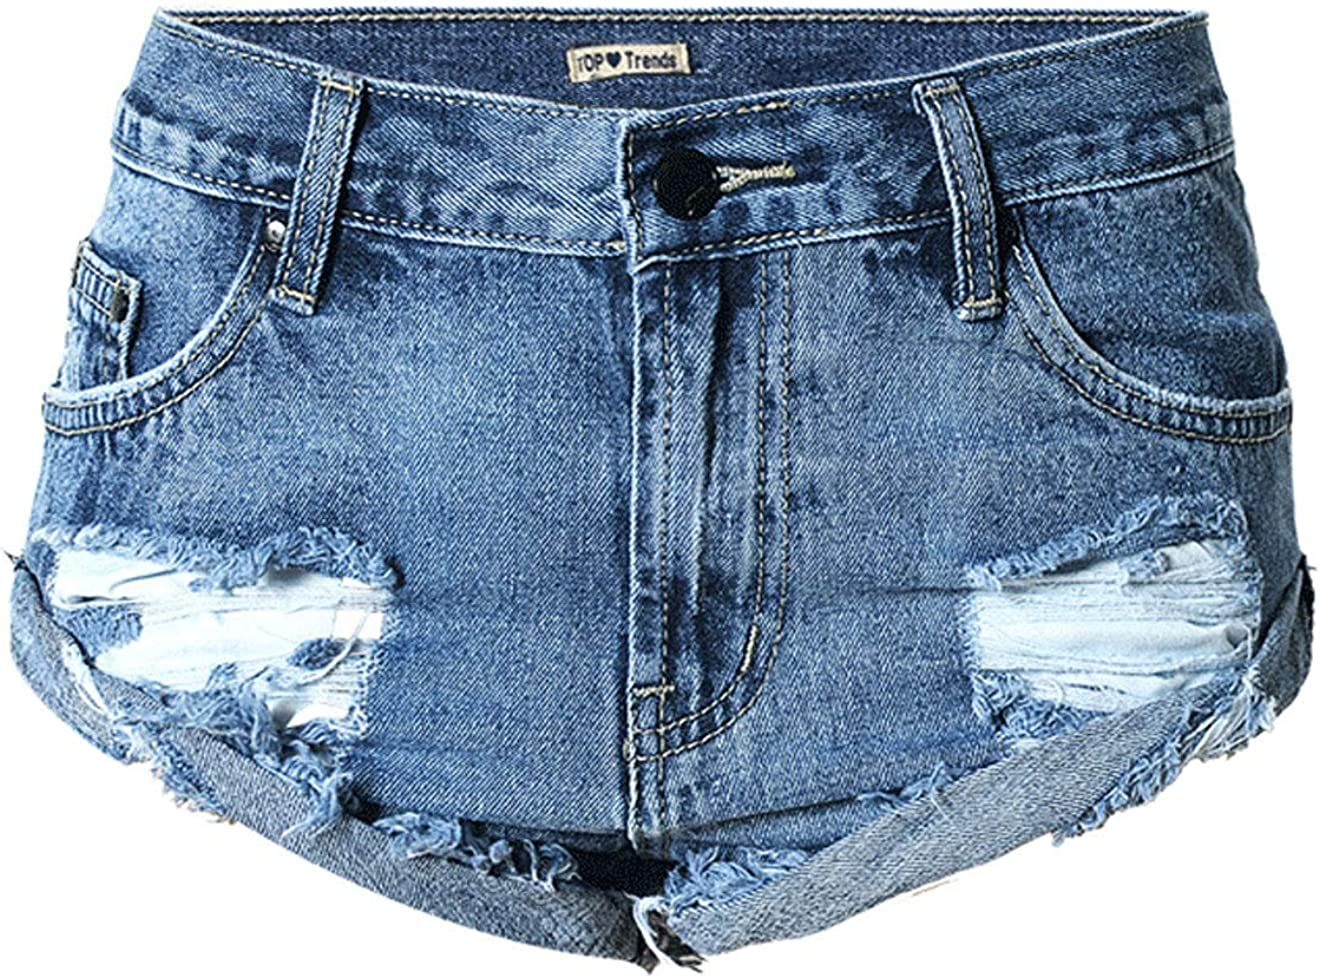 chouyatou Women's Sexy Mid-Rise Ripped Holes Folded Hem Chic Mini Denim Shorts